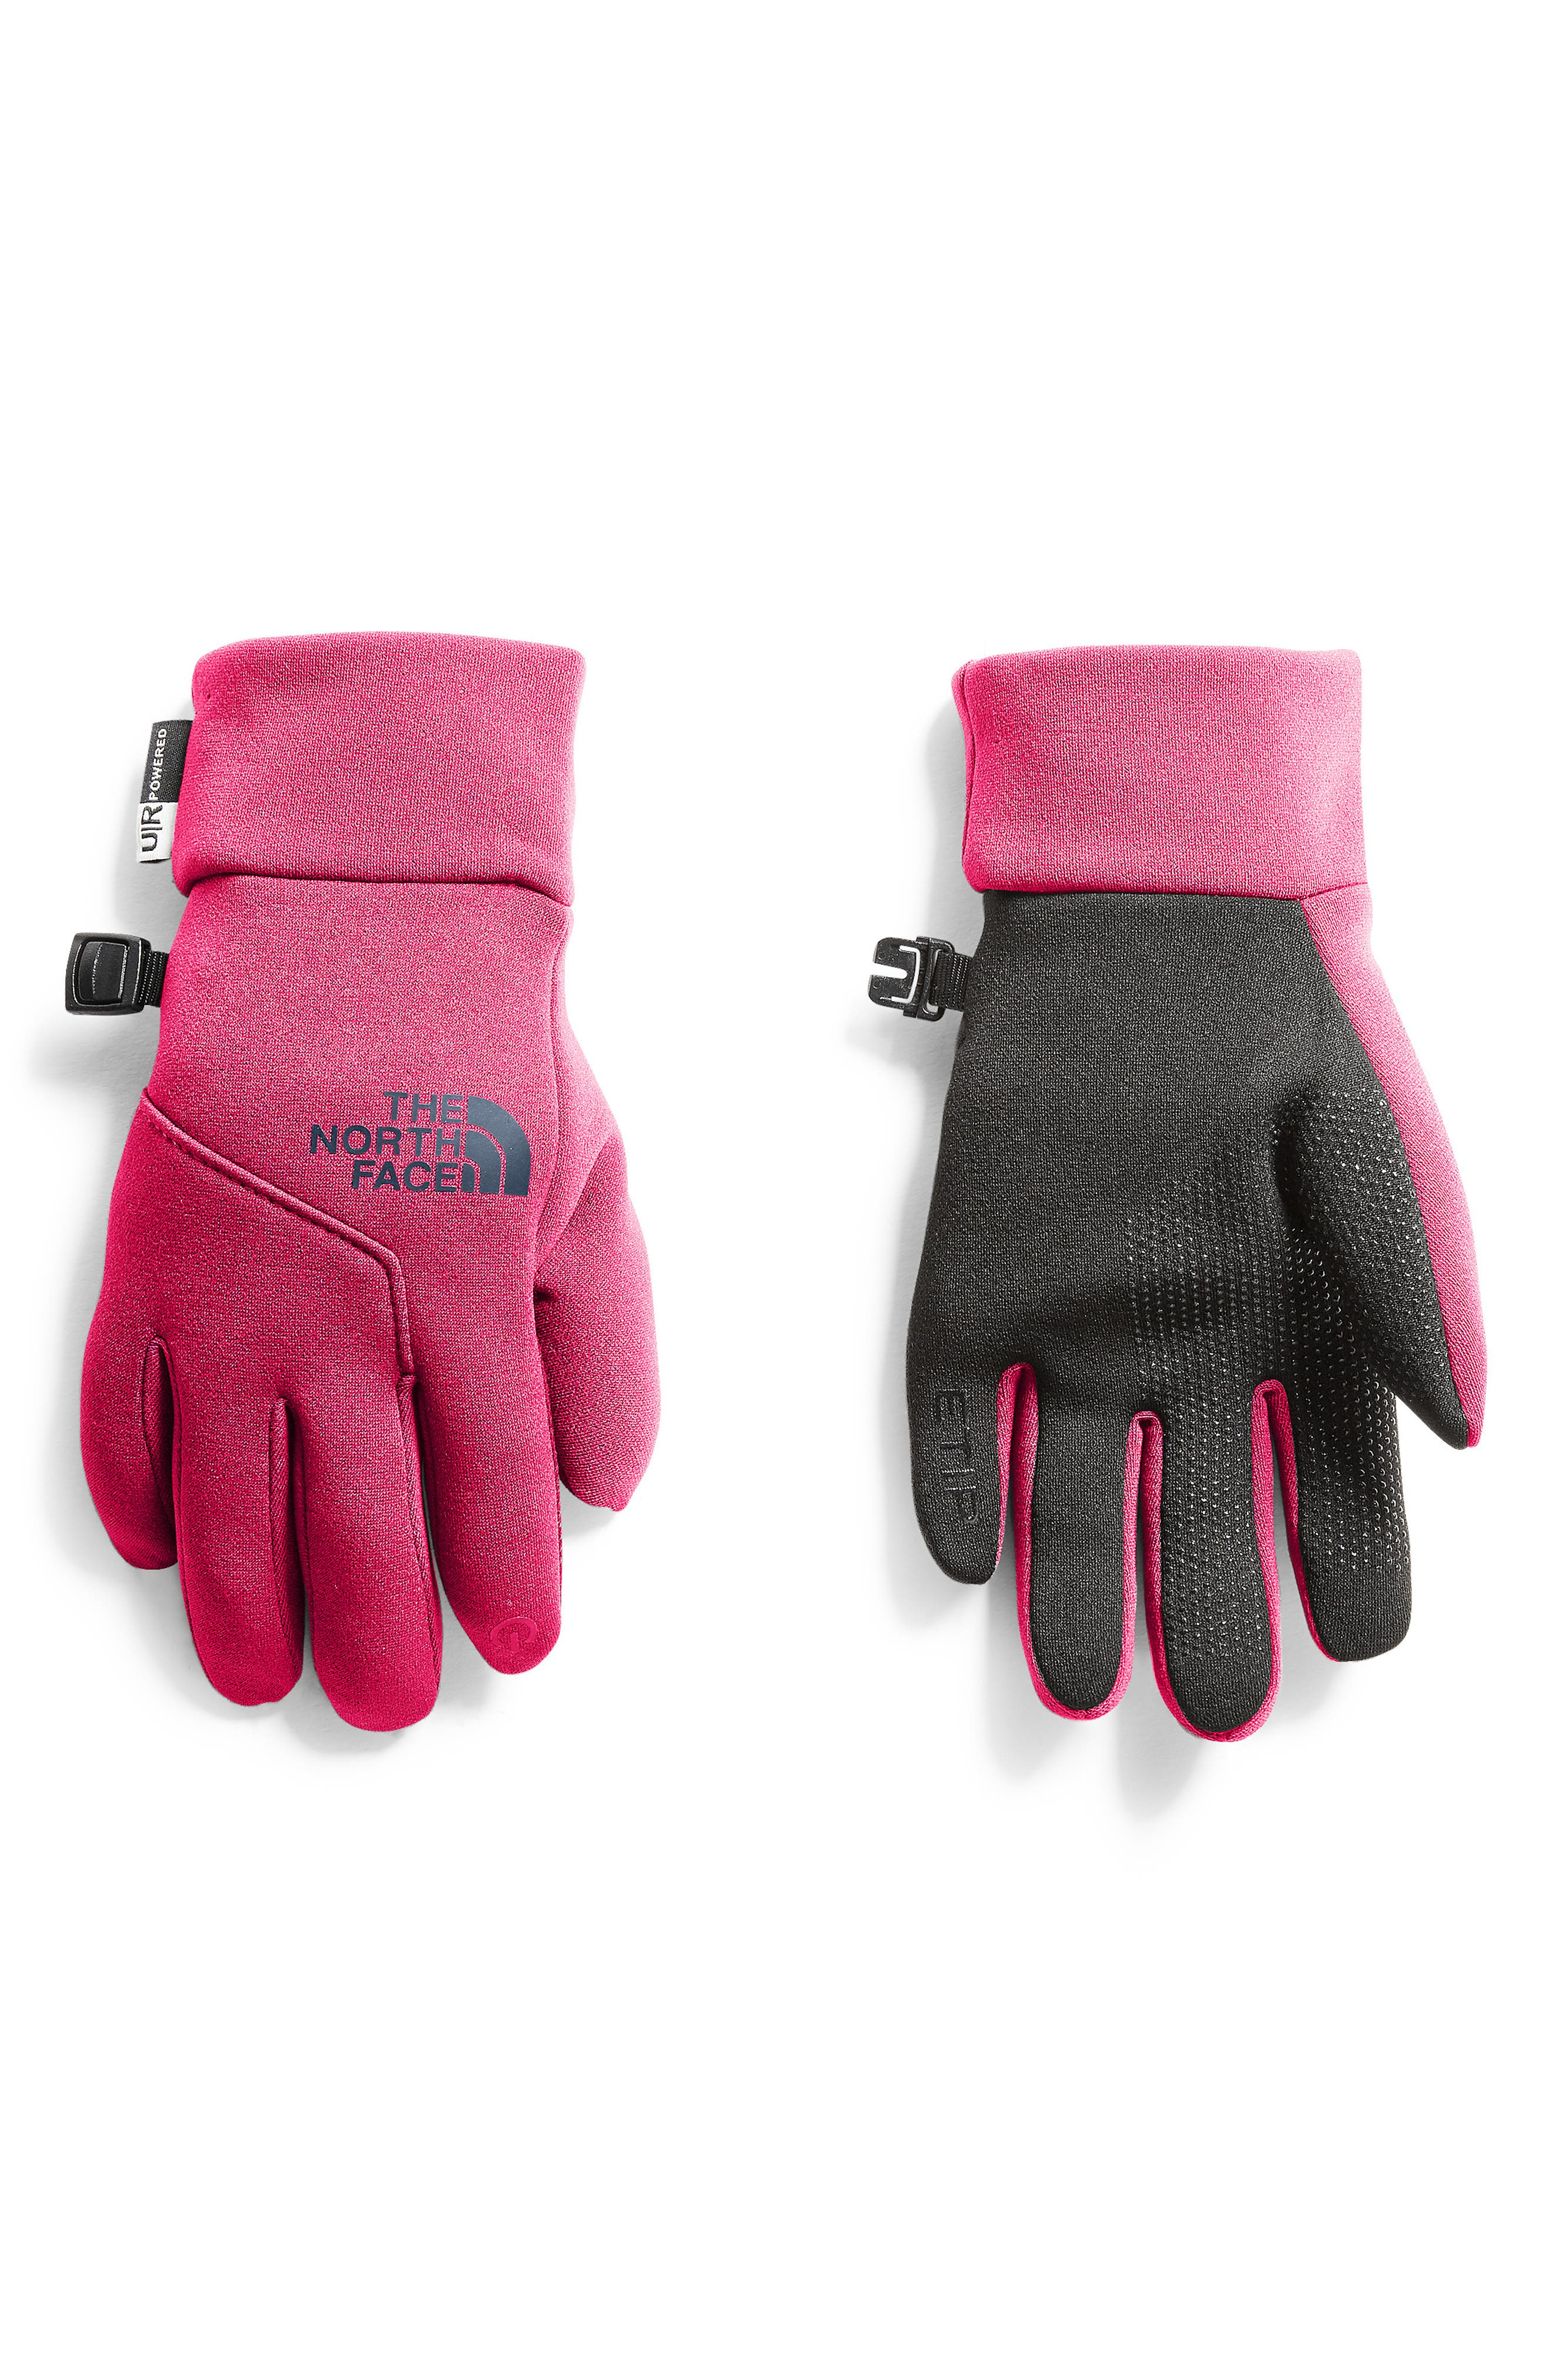 Girls The North Face Etip(TM) Gloves Size Large  Pink